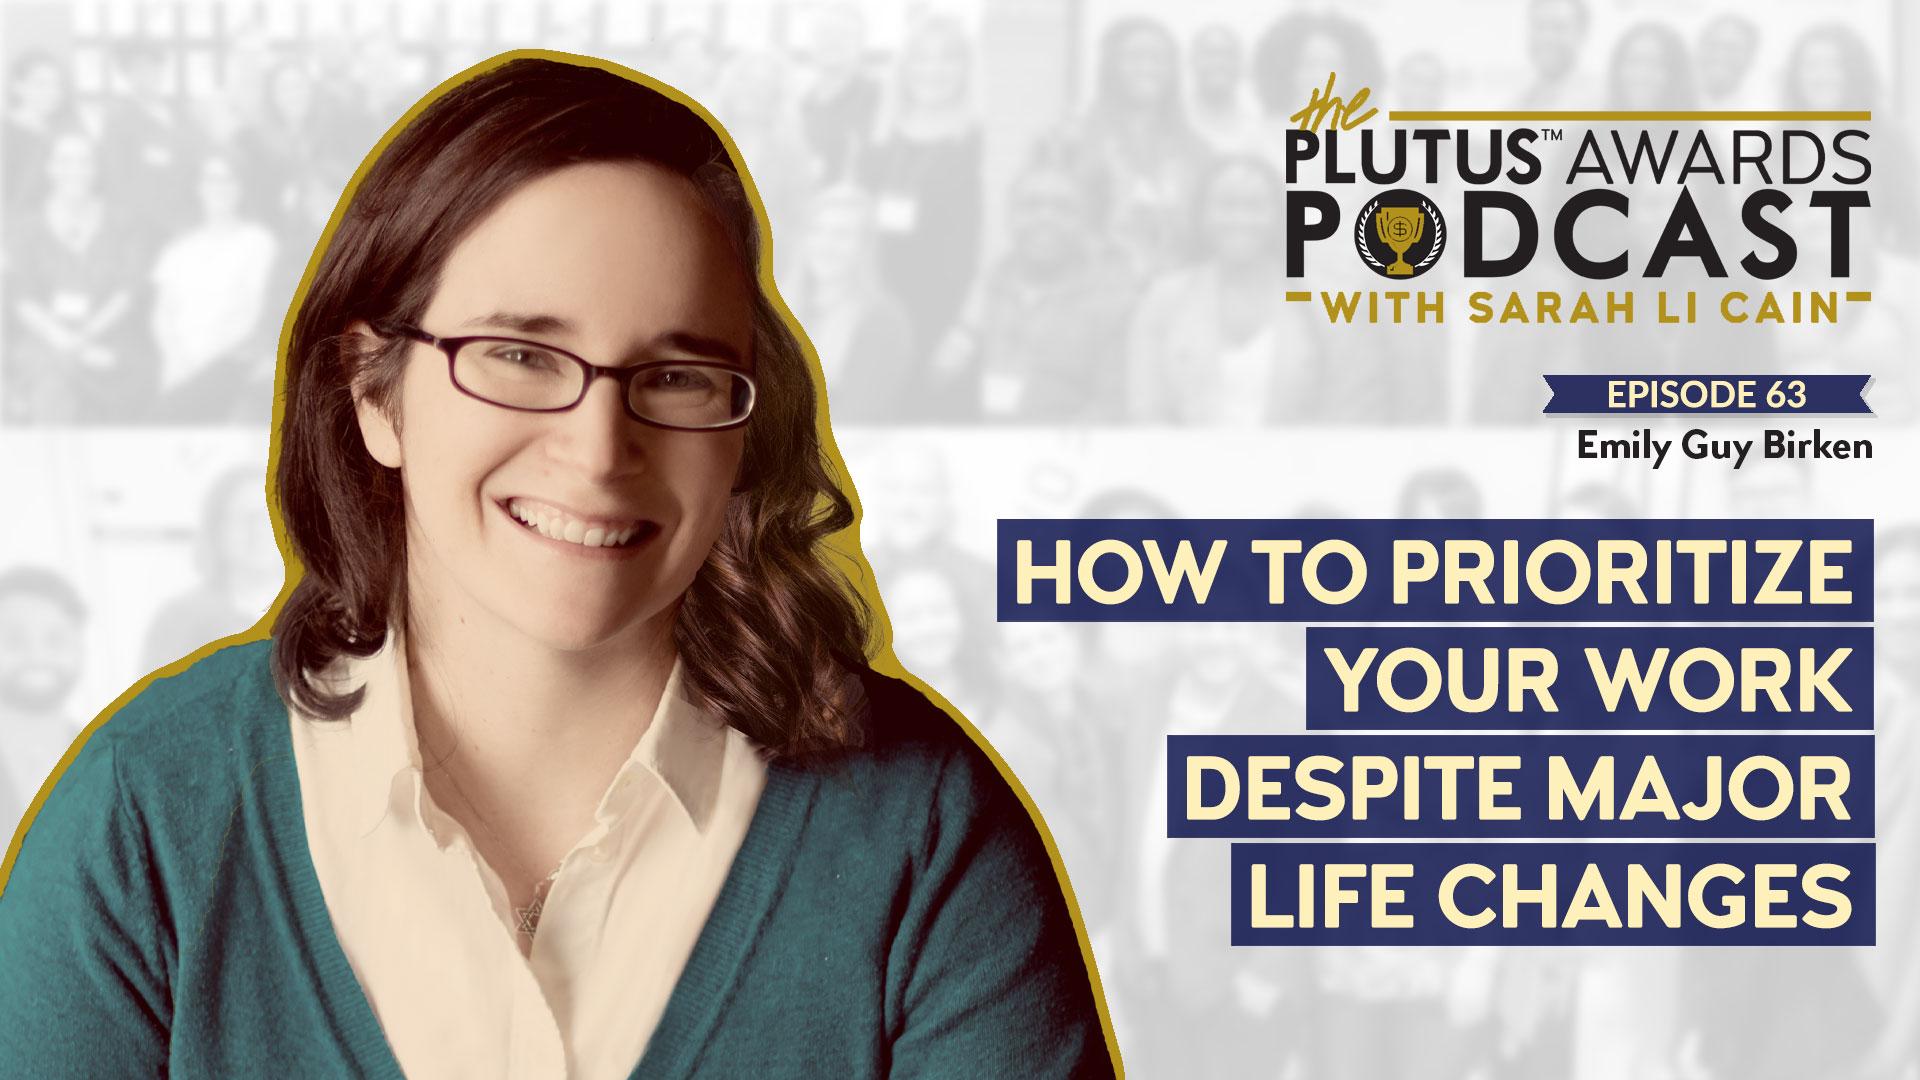 Emily Guy Birken - Plutus Awards Podcast Featured Image